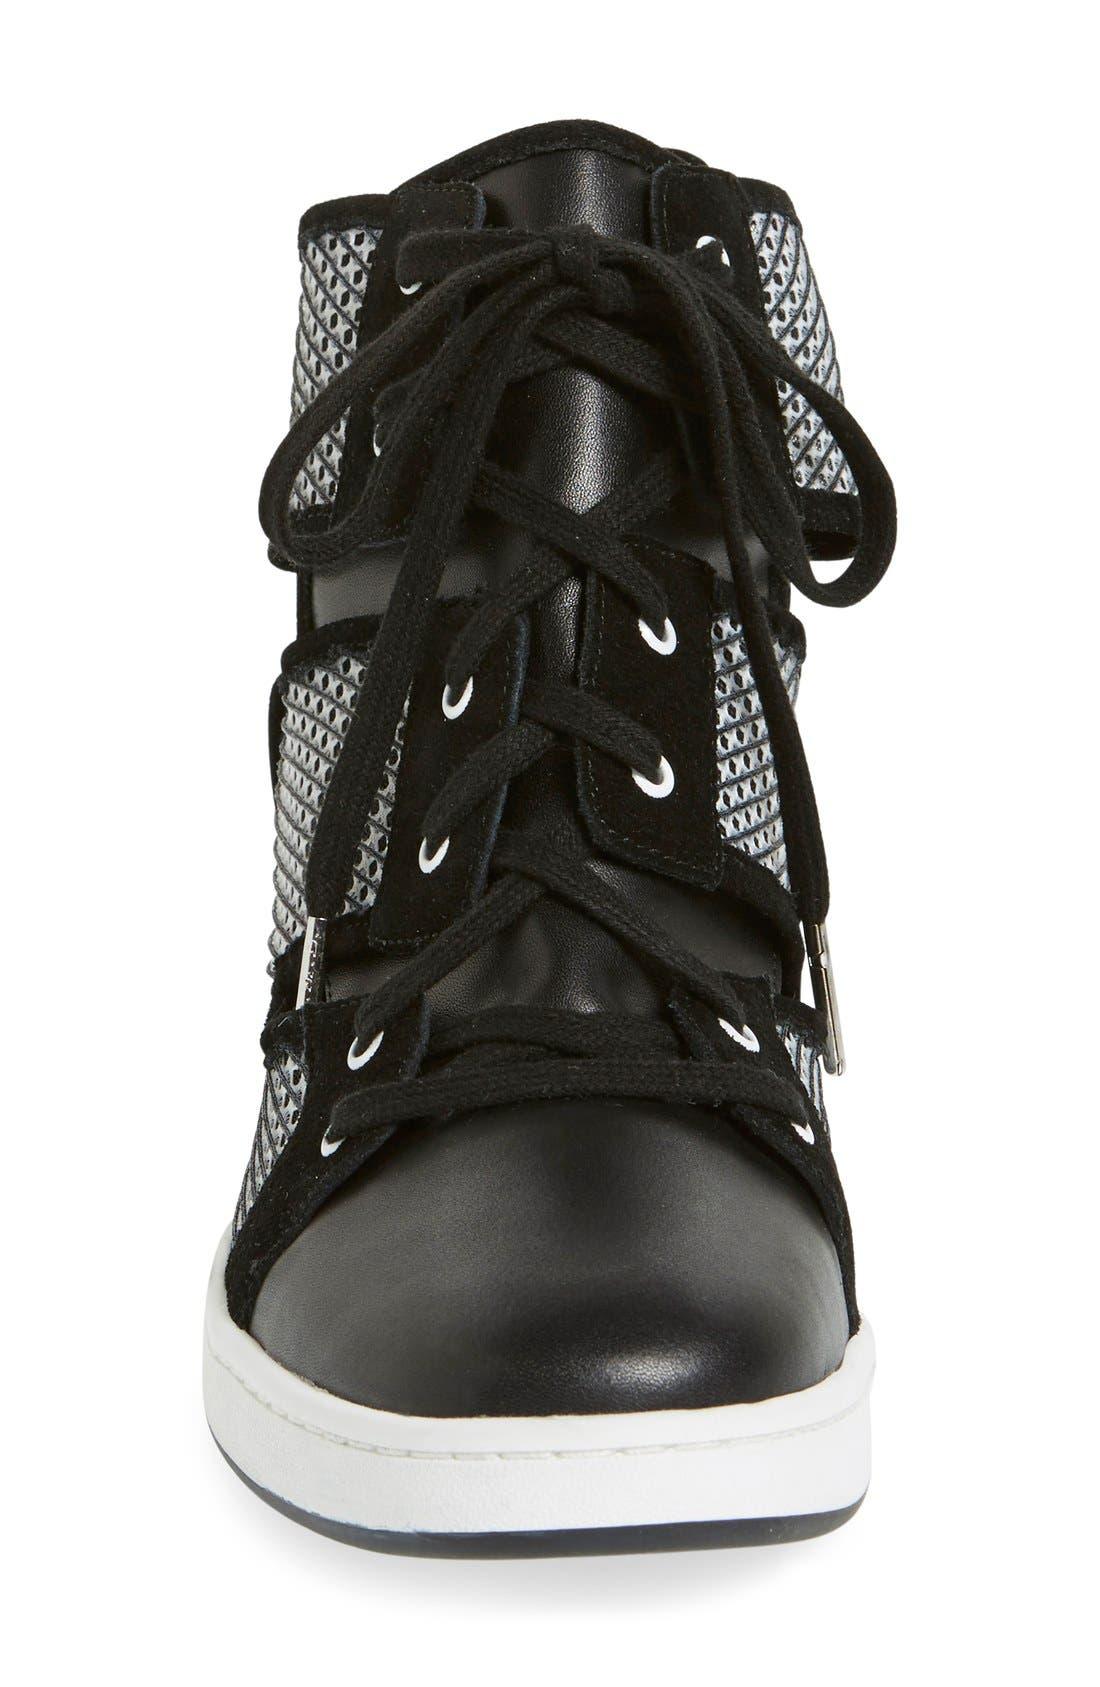 Alternate Image 3  - L.A.M.B. 'Gera' Hidden Wedge Sneaker (Women)